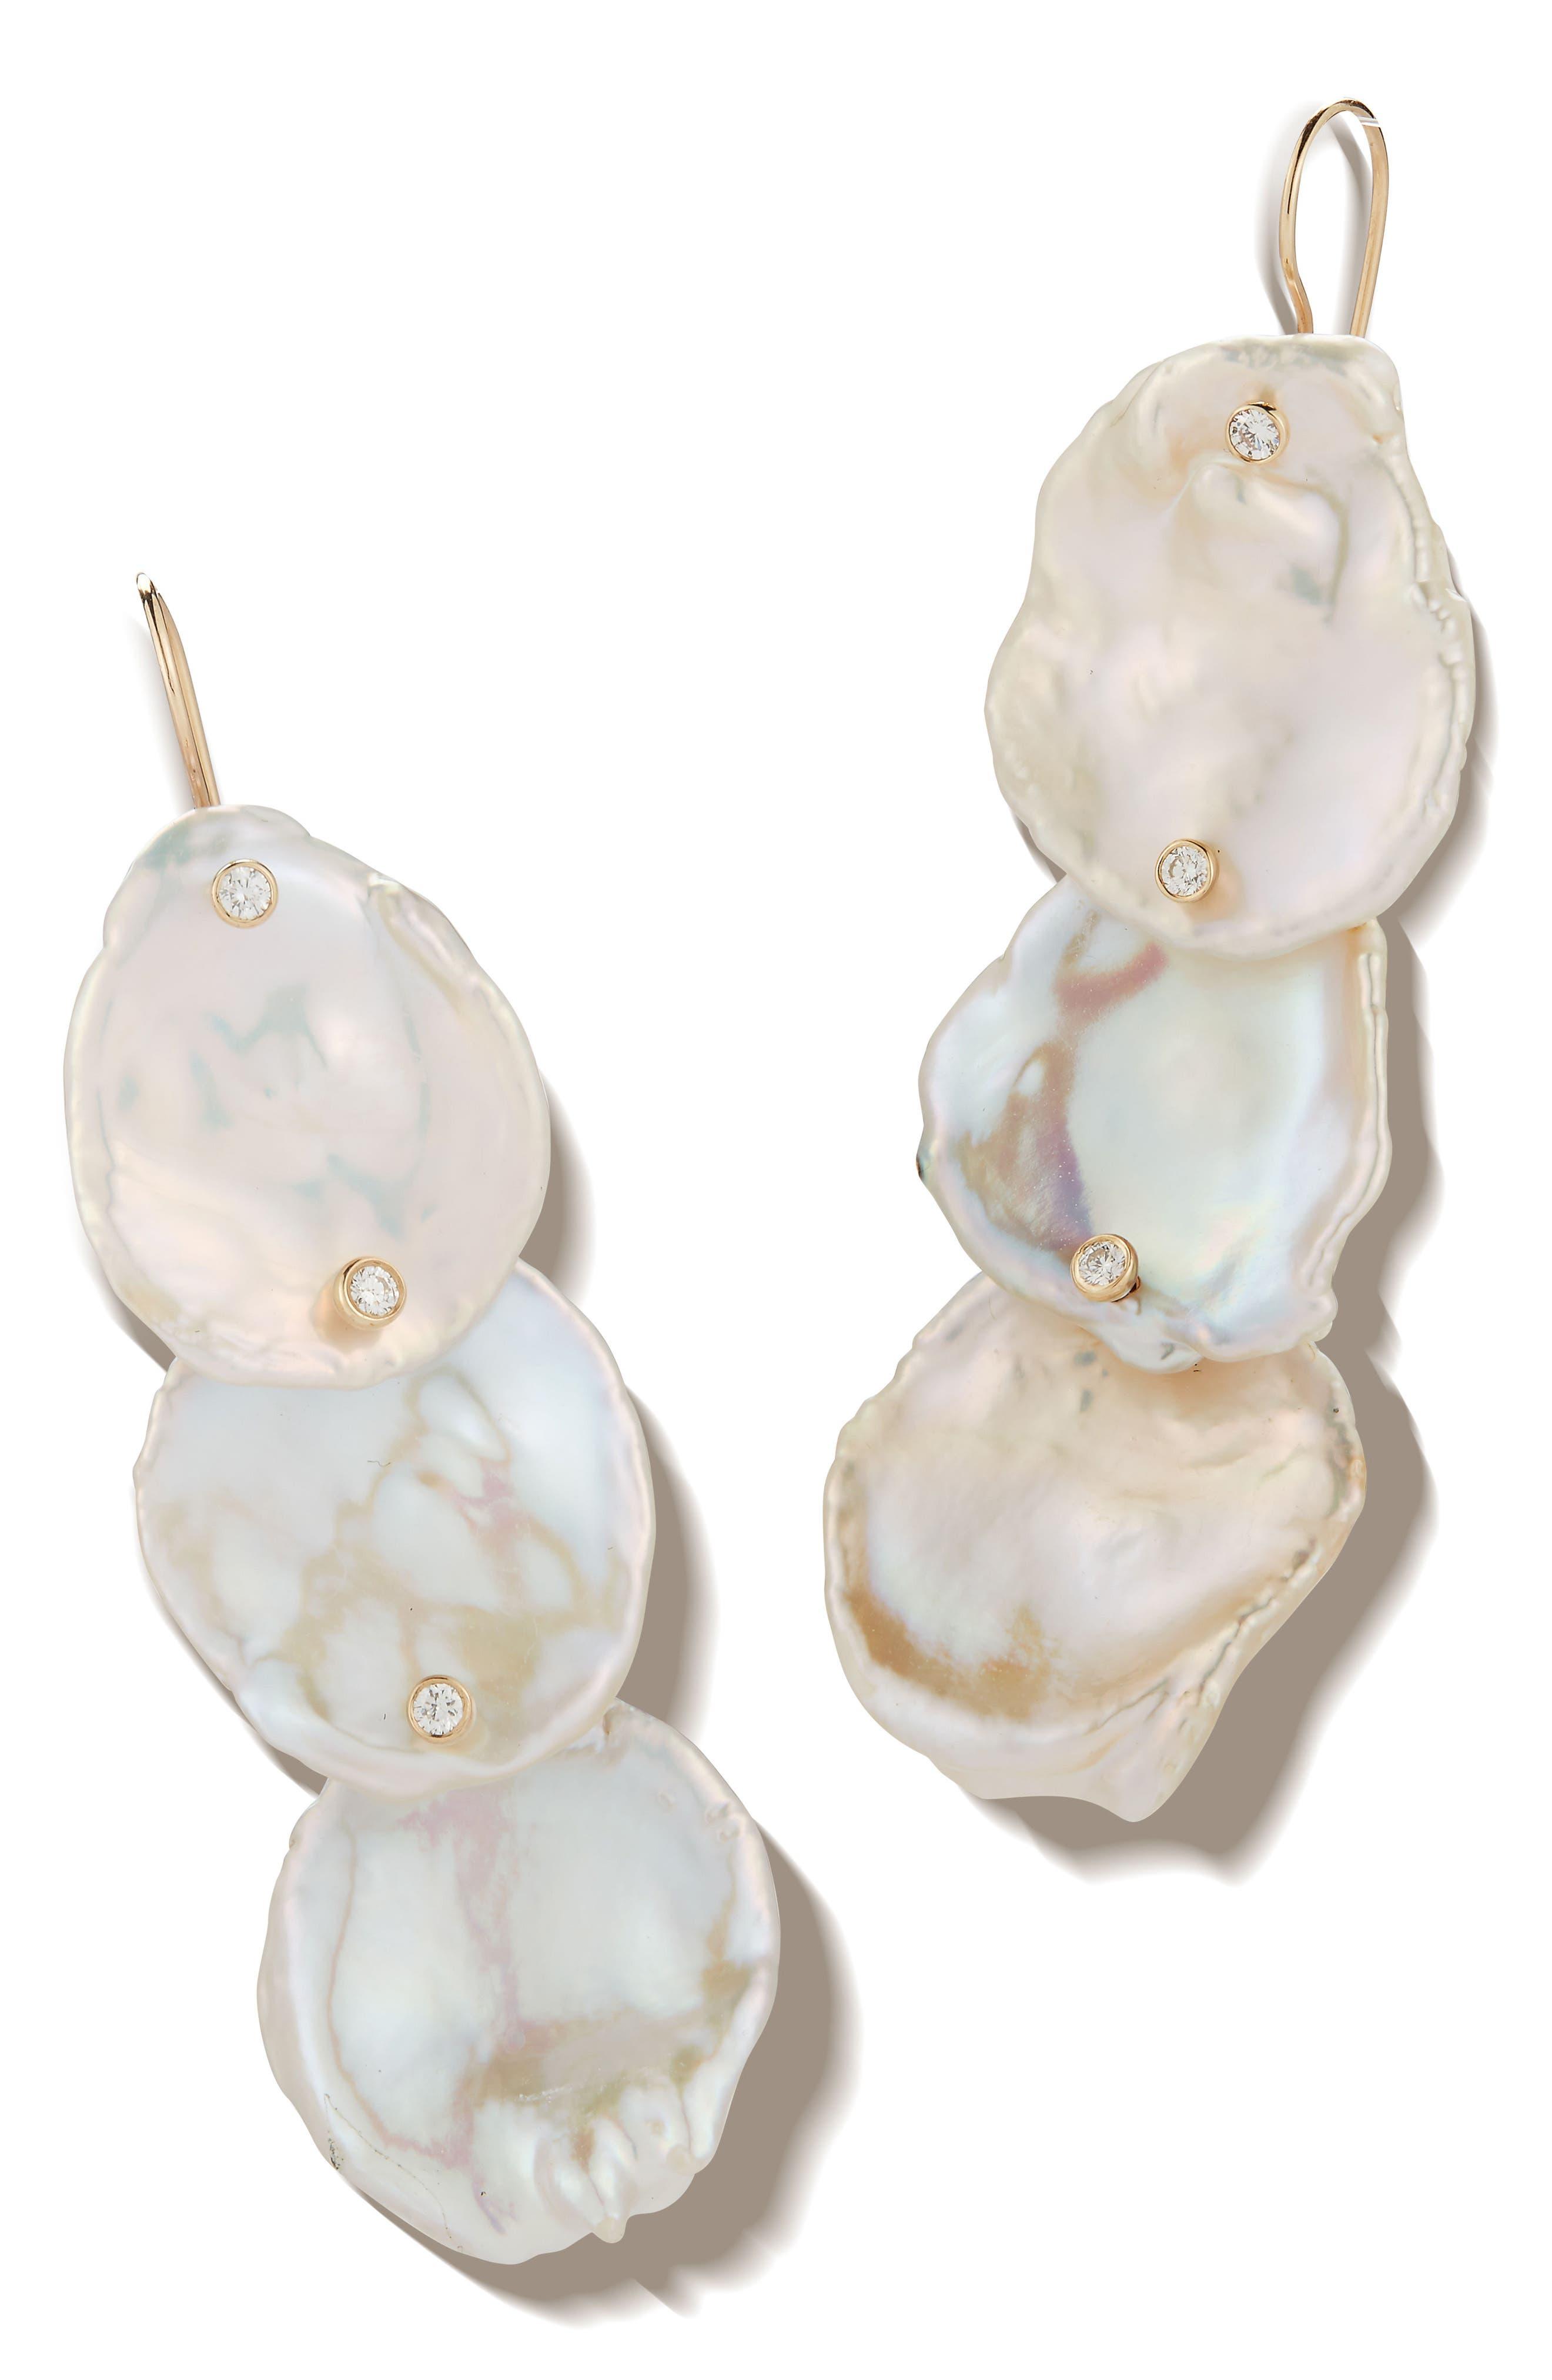 3-Tier Flat Pearl & Diamond Drop Earrings,                             Main thumbnail 1, color,                             Yellow Gold/ Pearl